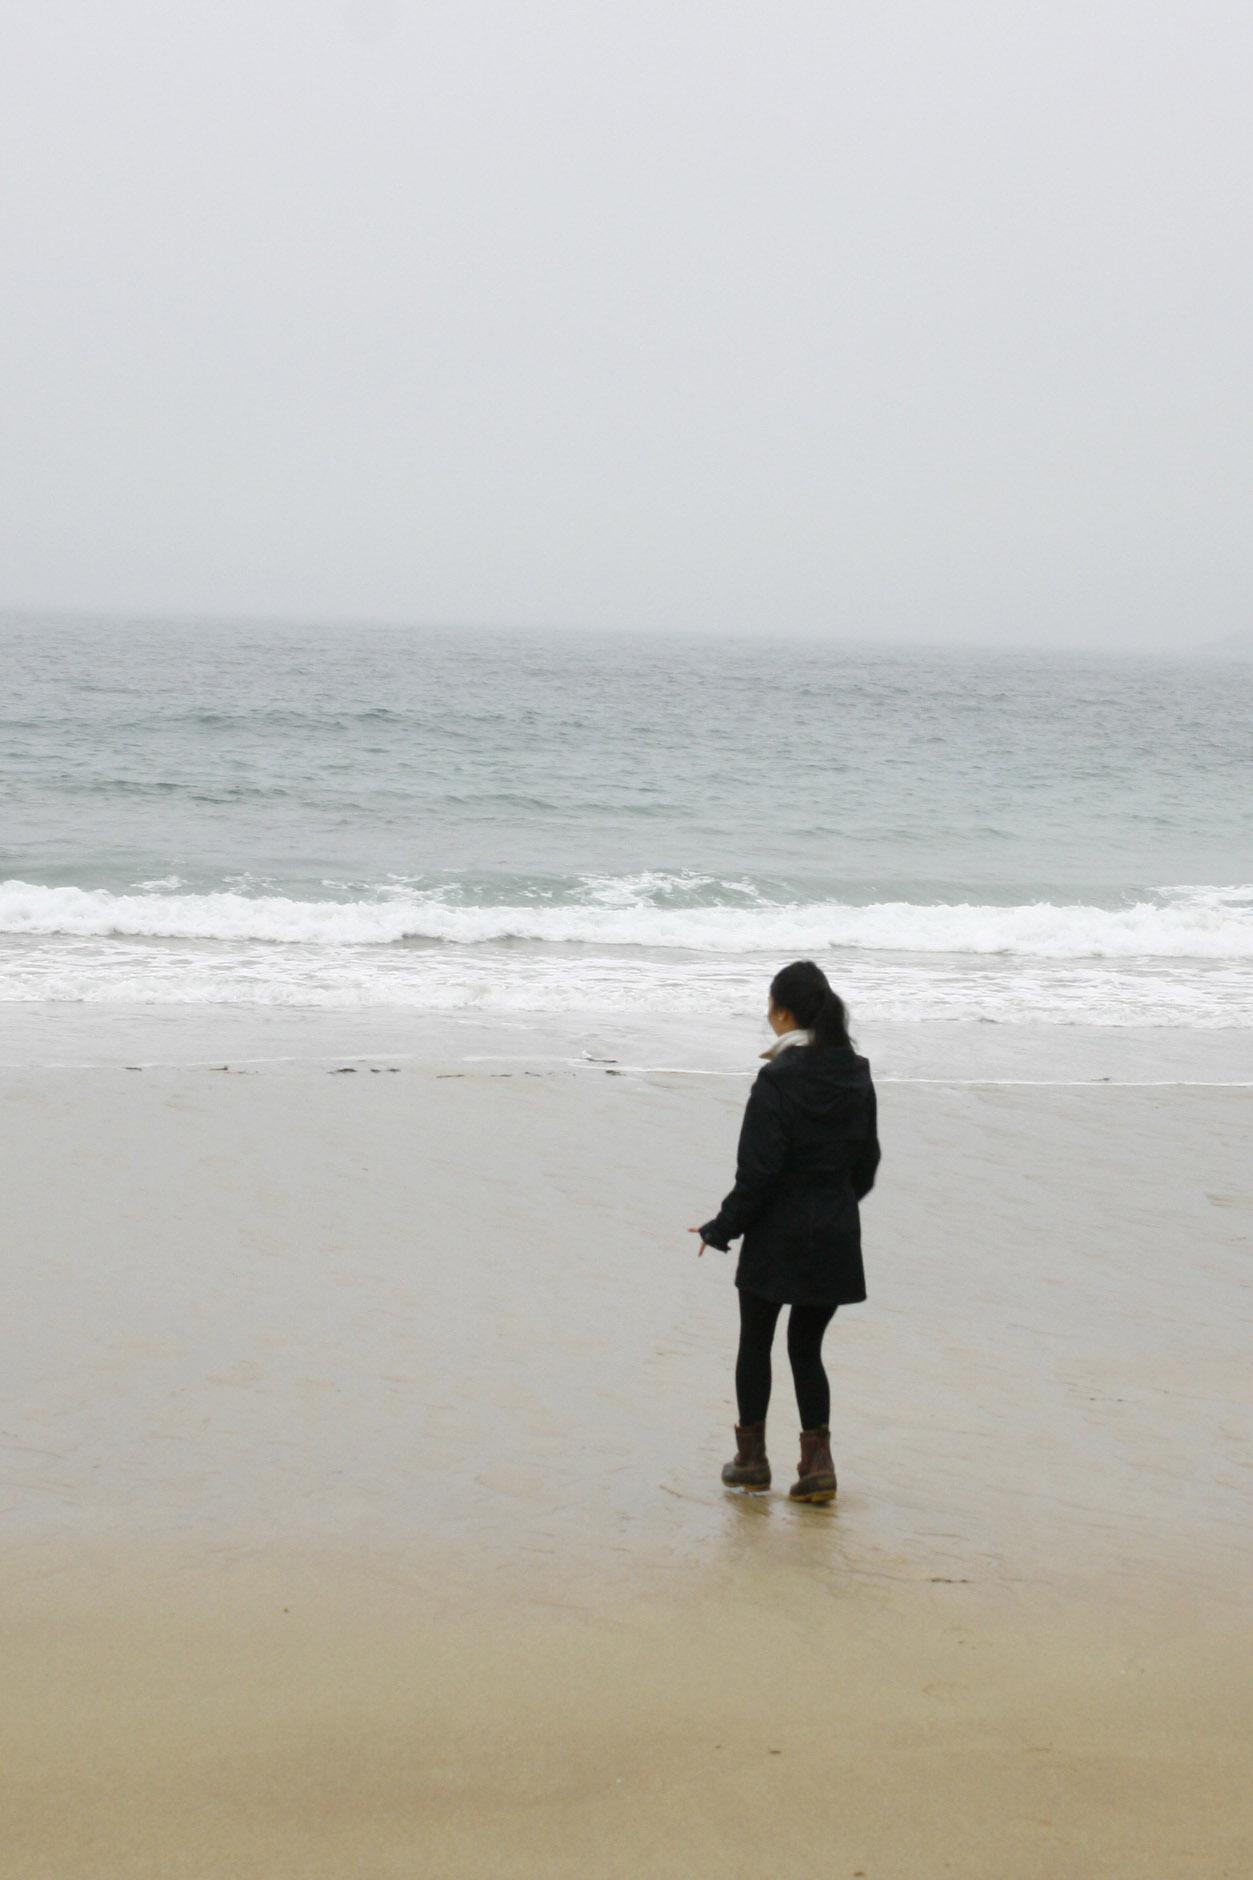 Sand Beach in the Winter, Acadia National Park, Maine